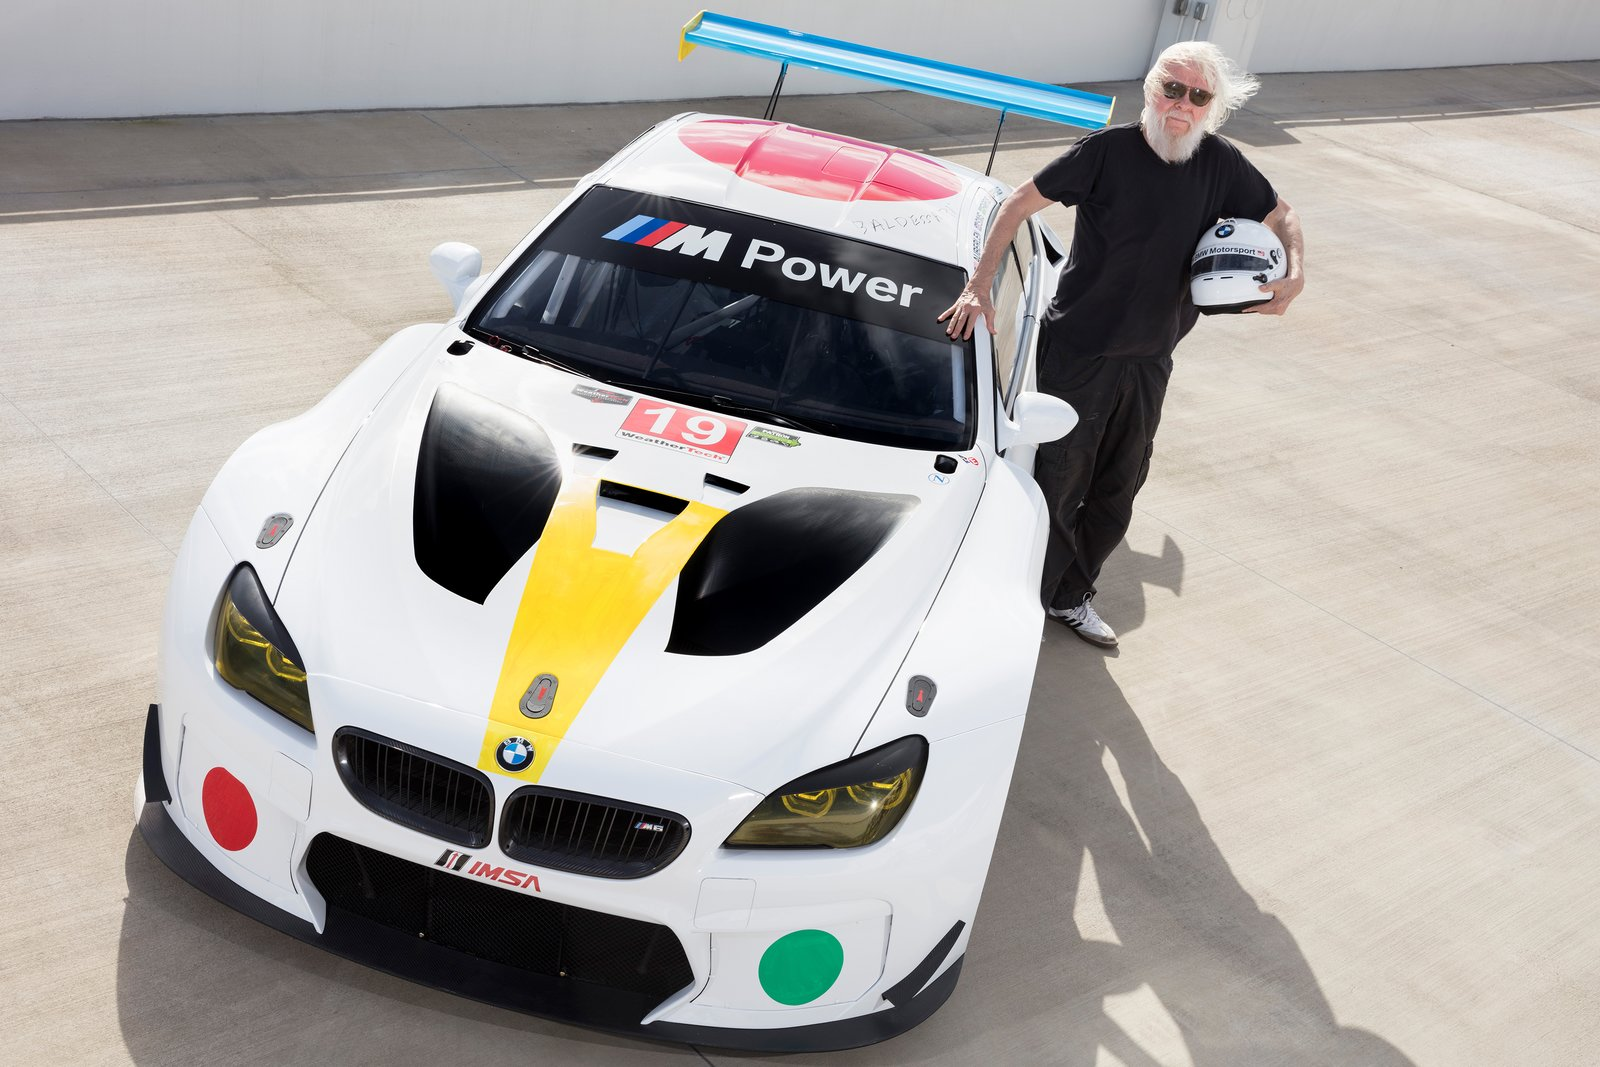 Photo 1 of 12 in John Baldessari Blazes a Trail at the Daytona International Speedway With BMW Art Car #19